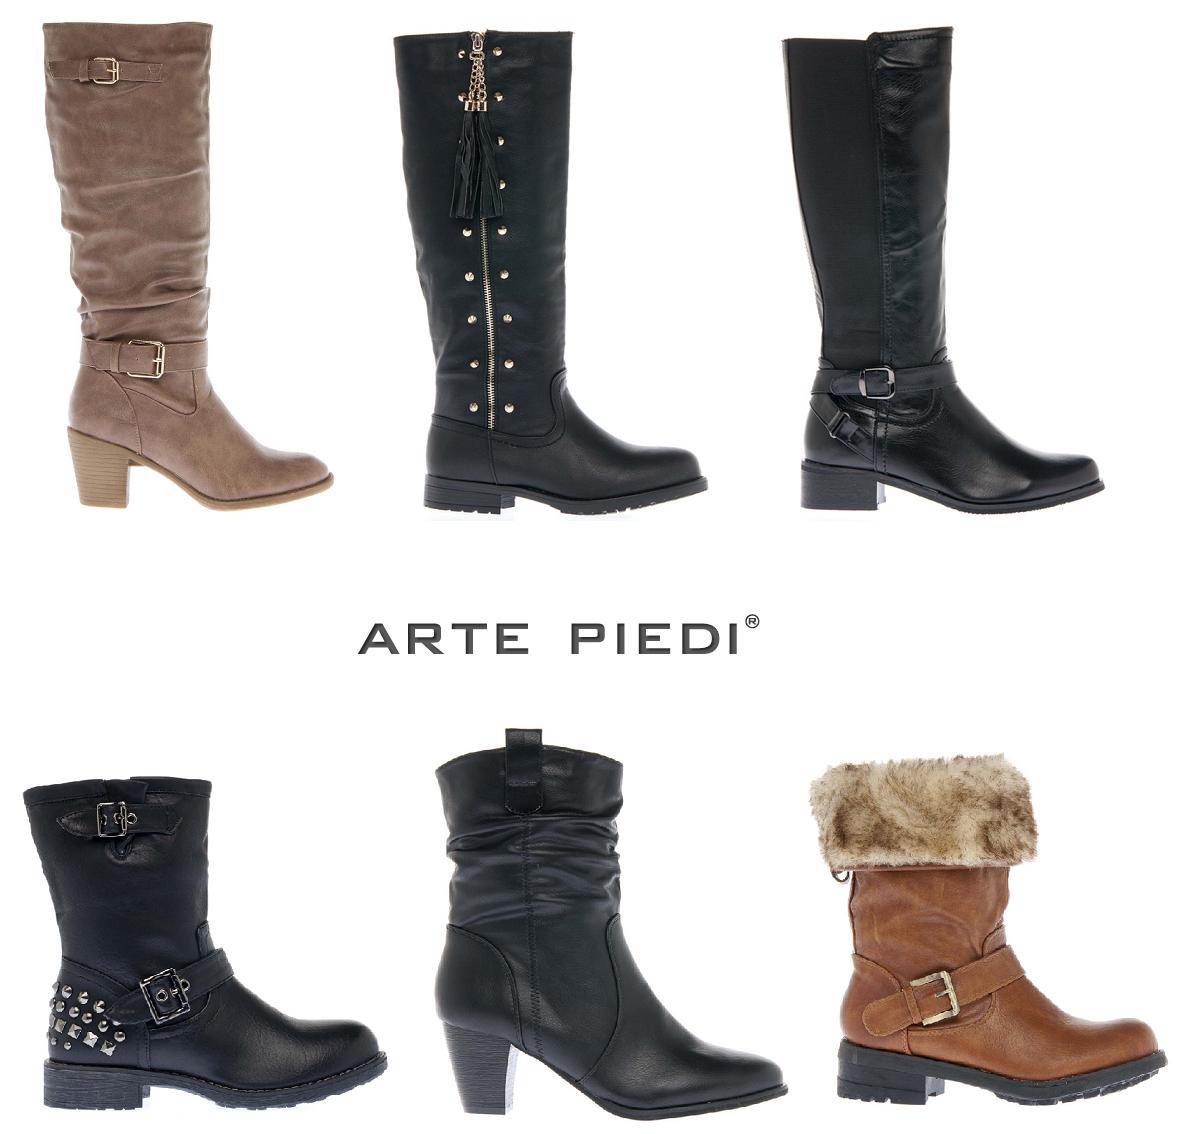 f357fbb6820 Η εταιρία ARTE PIEDI μας παρουσιάζει την νέα συλλογή της για την σεζόν  Φθινόπωρο Χειμώνας 2013-2014. Μπότες , μποτάκια και μπαλαρίνες για casual  αλλά και ...